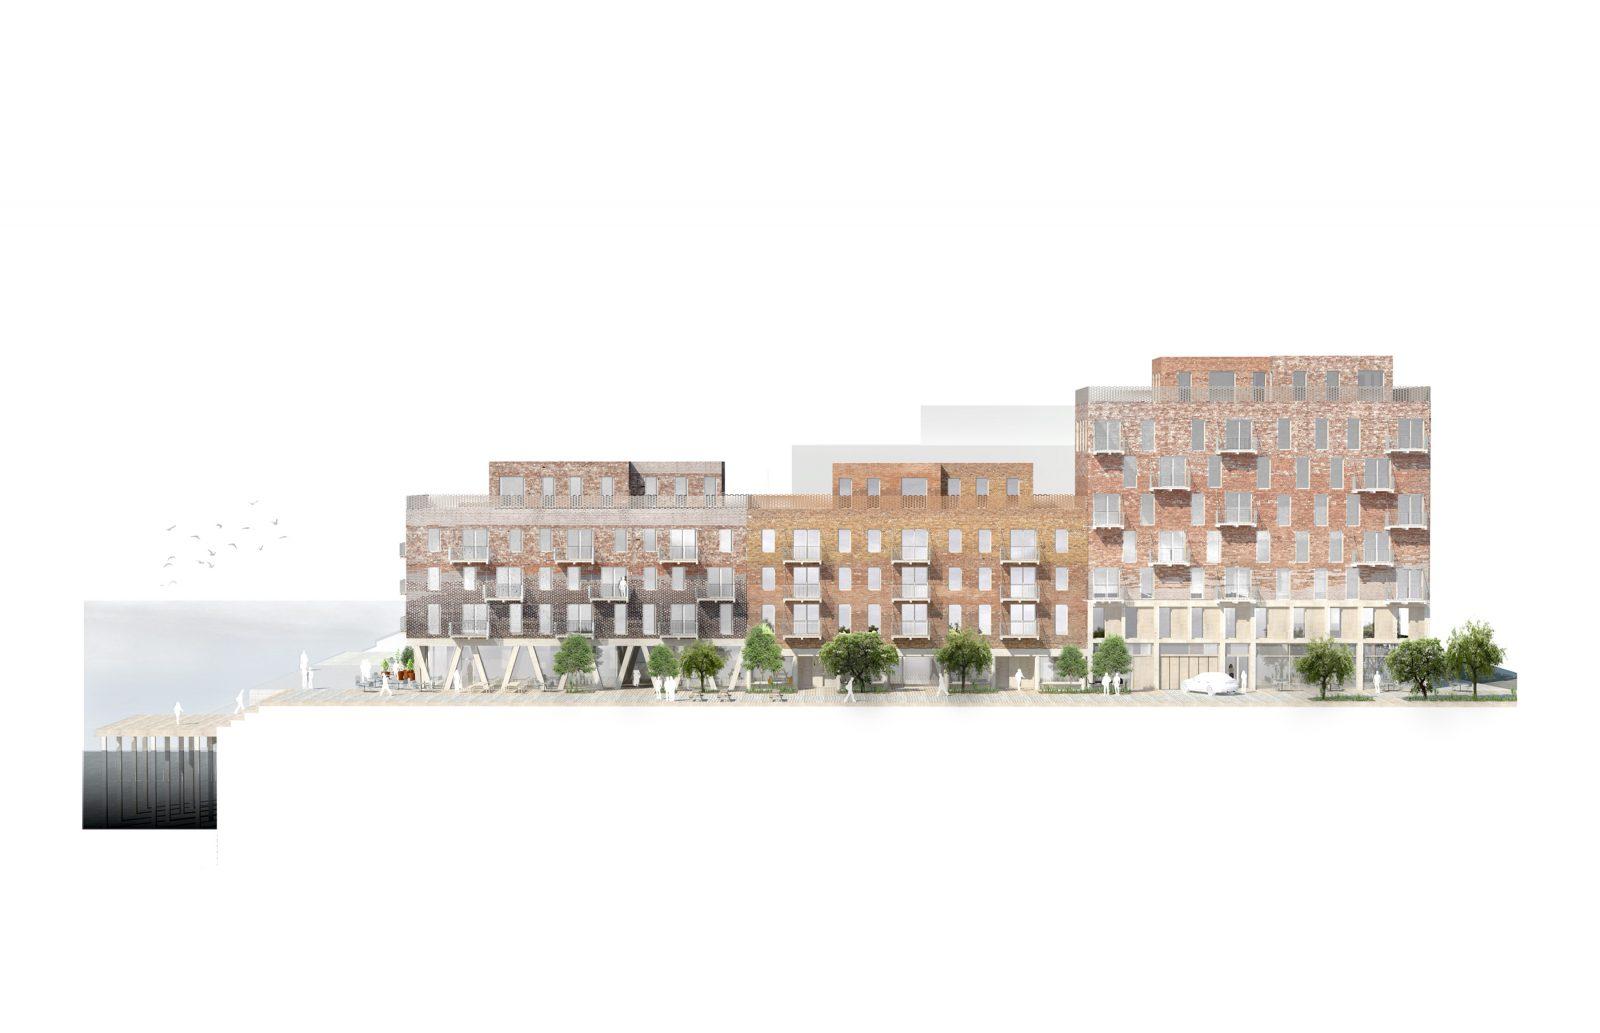 KjellanderSjoberg Oceanhamnen fasad-ost sektion 3600x2324px